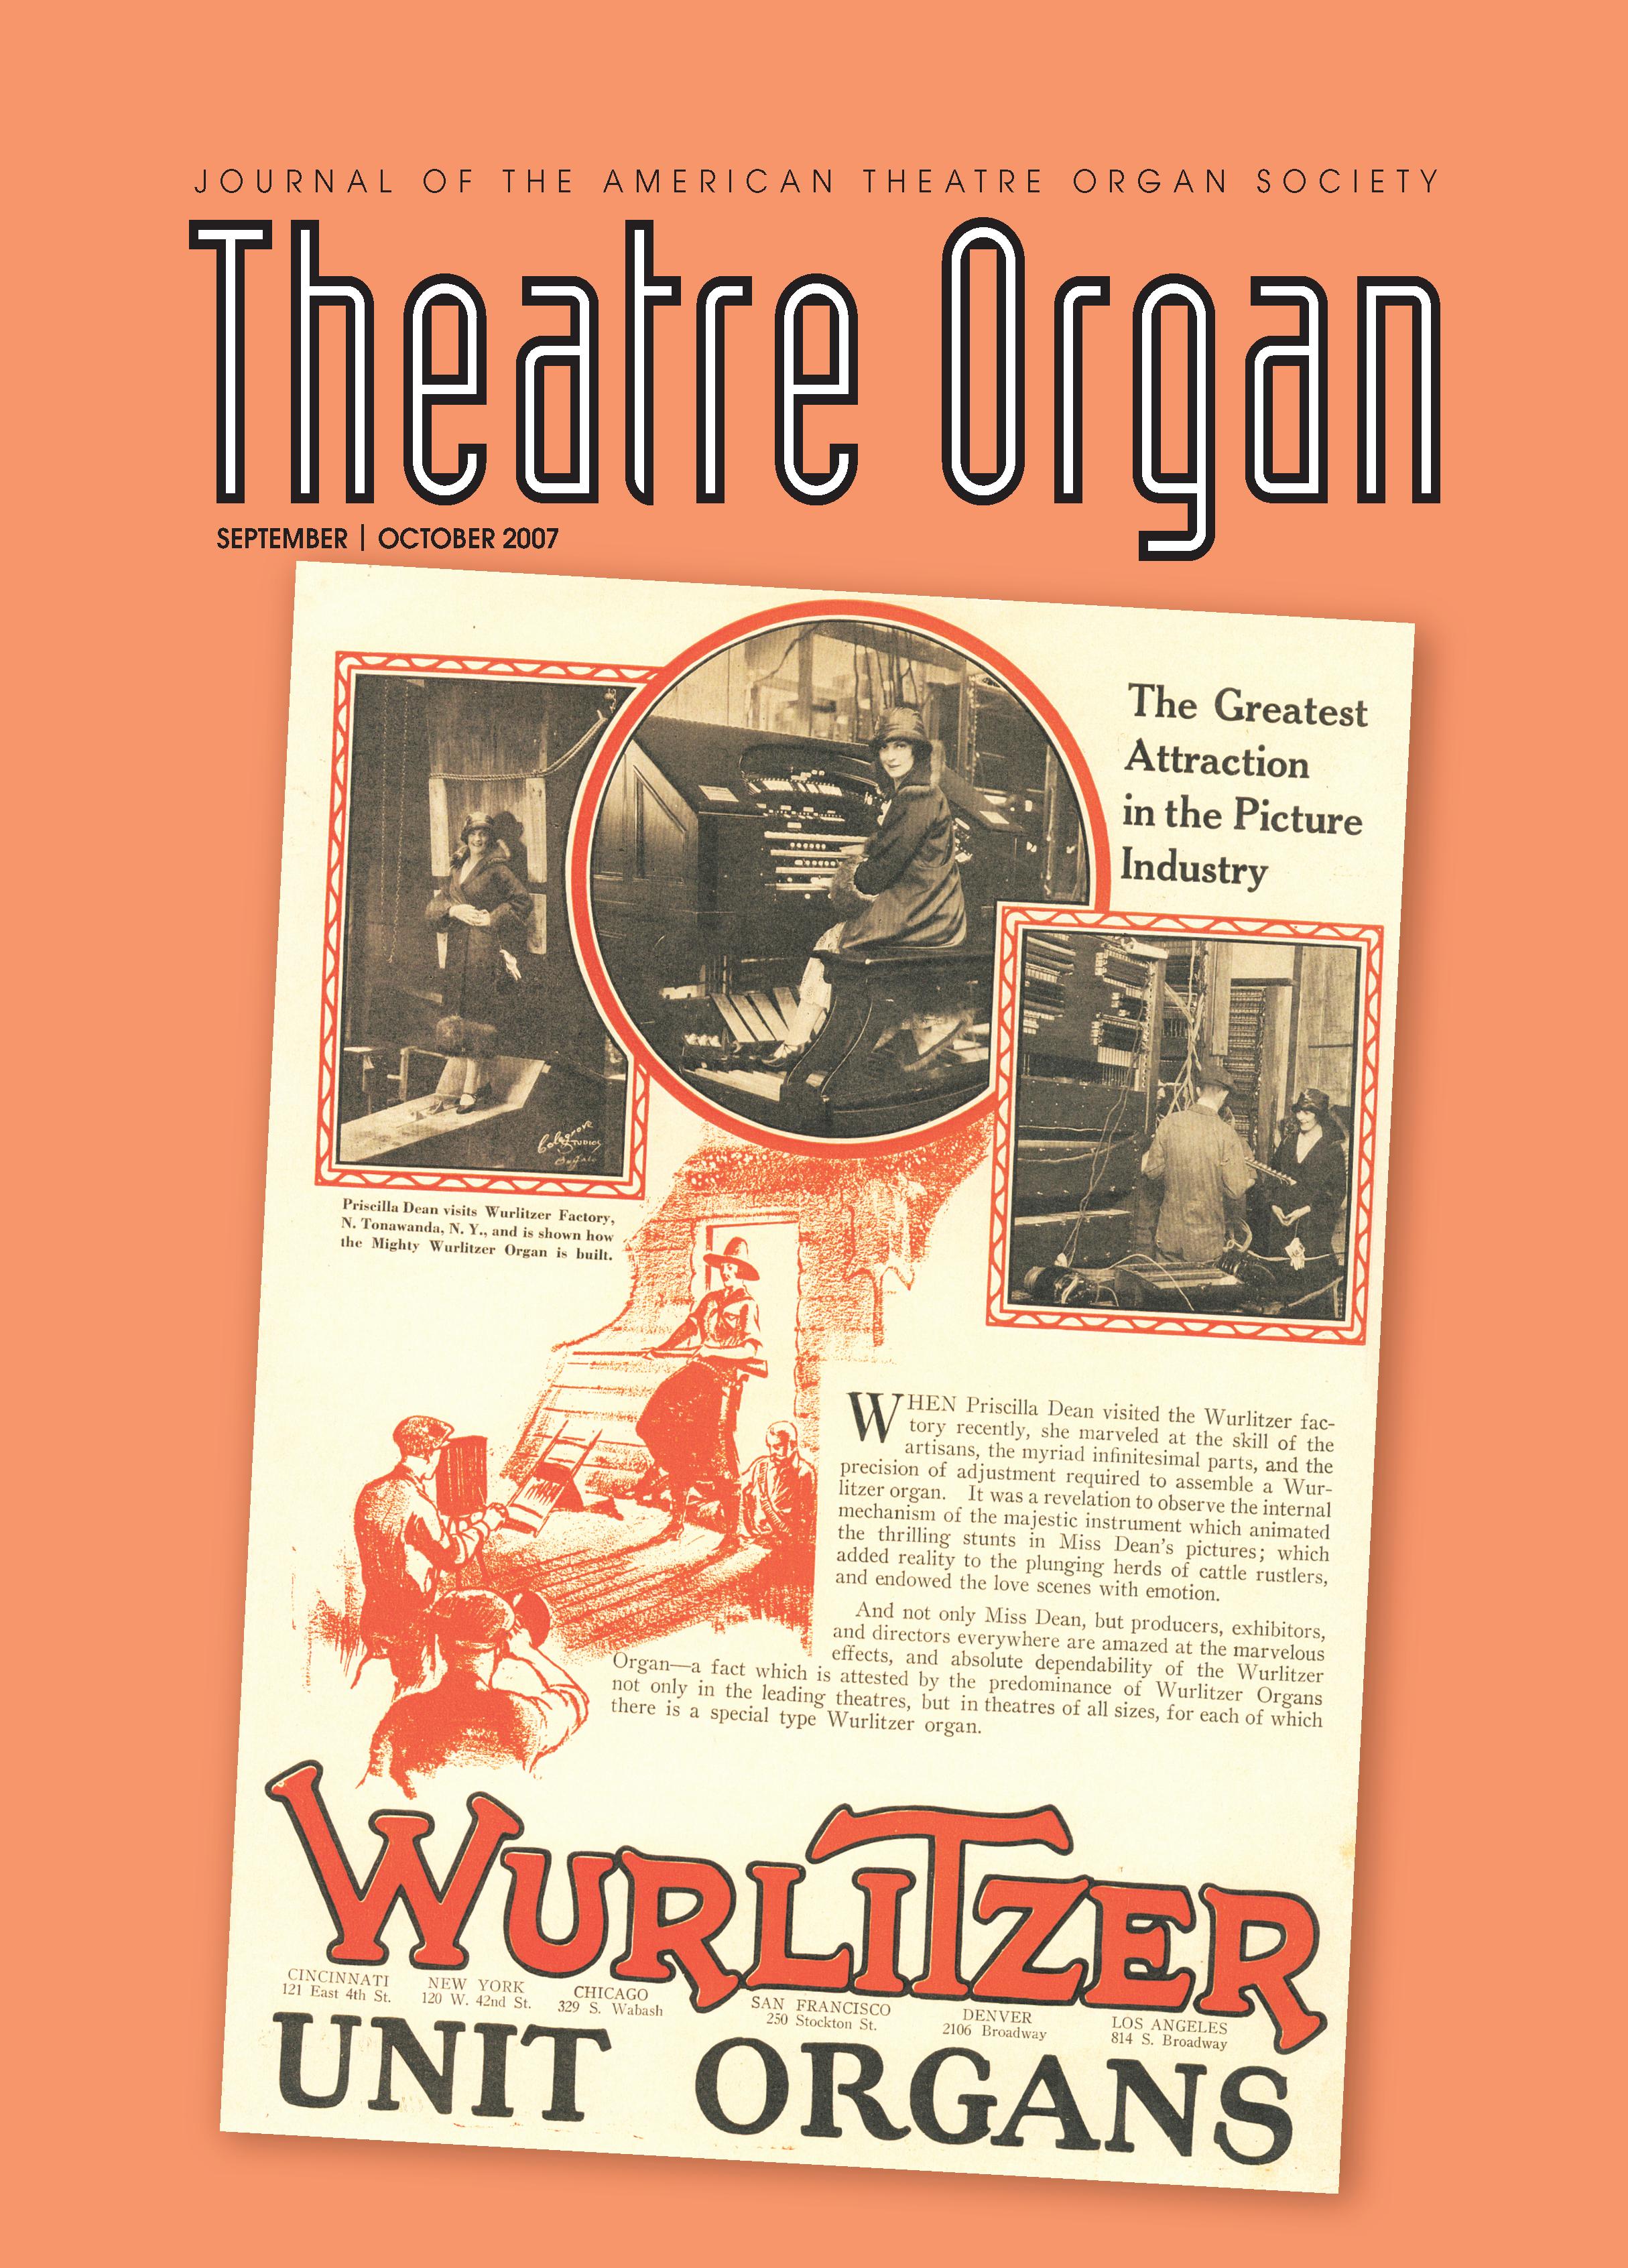 Theatre Organ, September - October 2007, Volume 49, Number 5